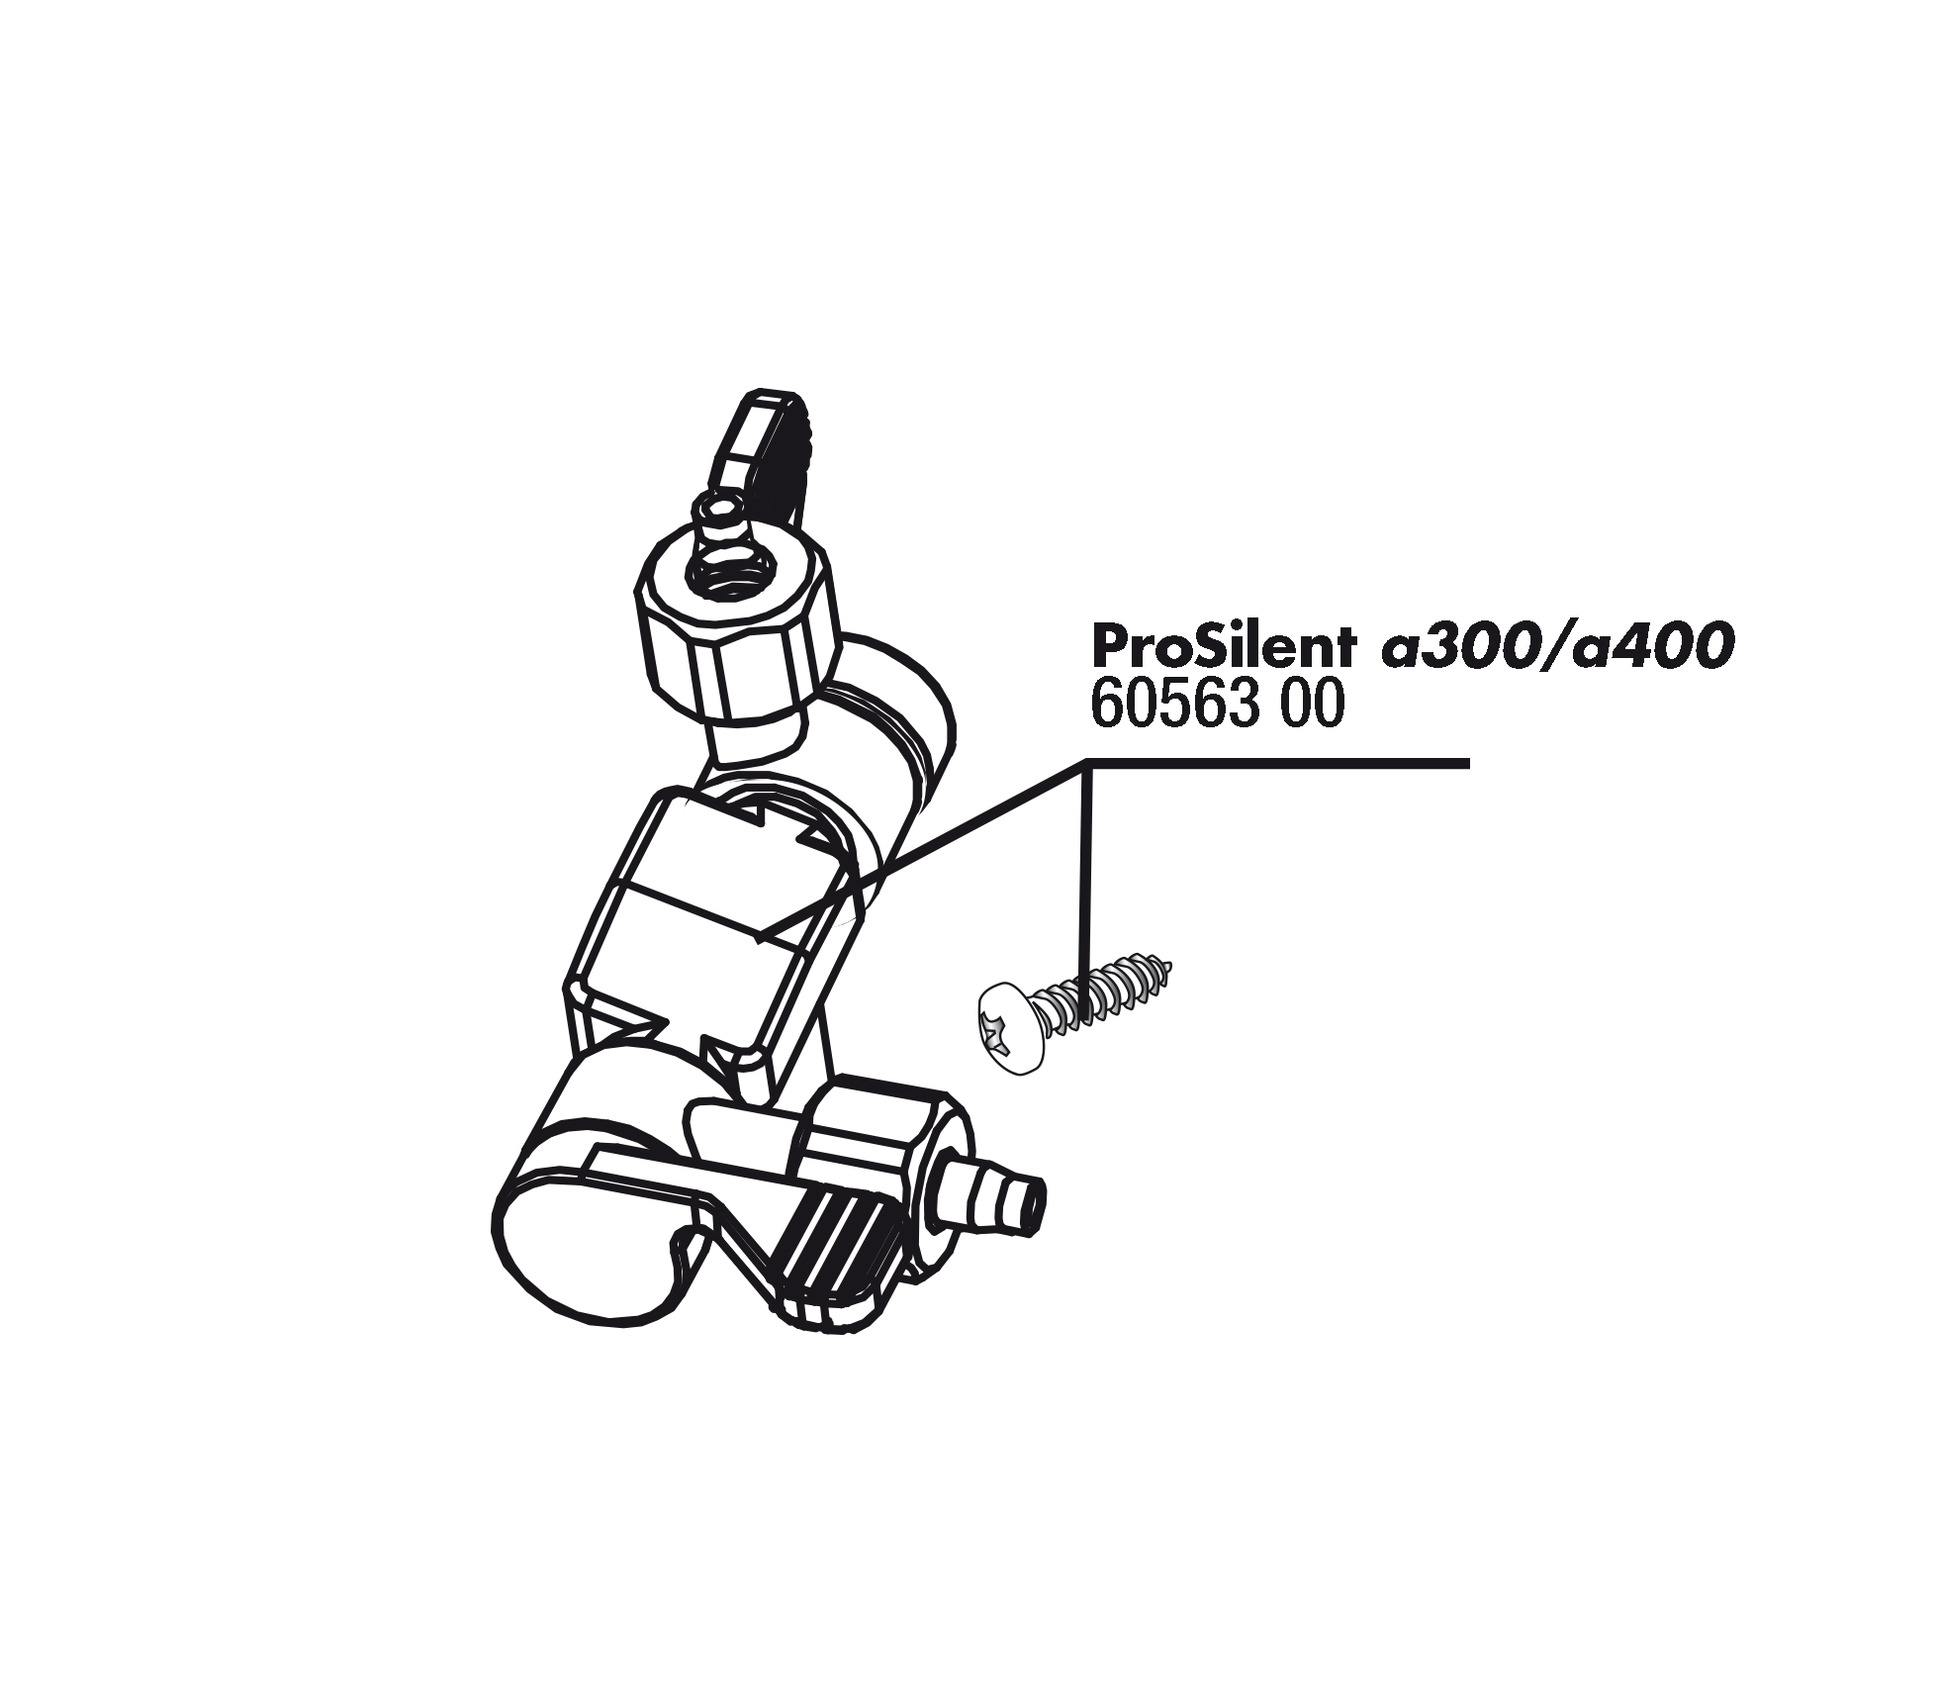 JBL ProSilent a300/400 air connection